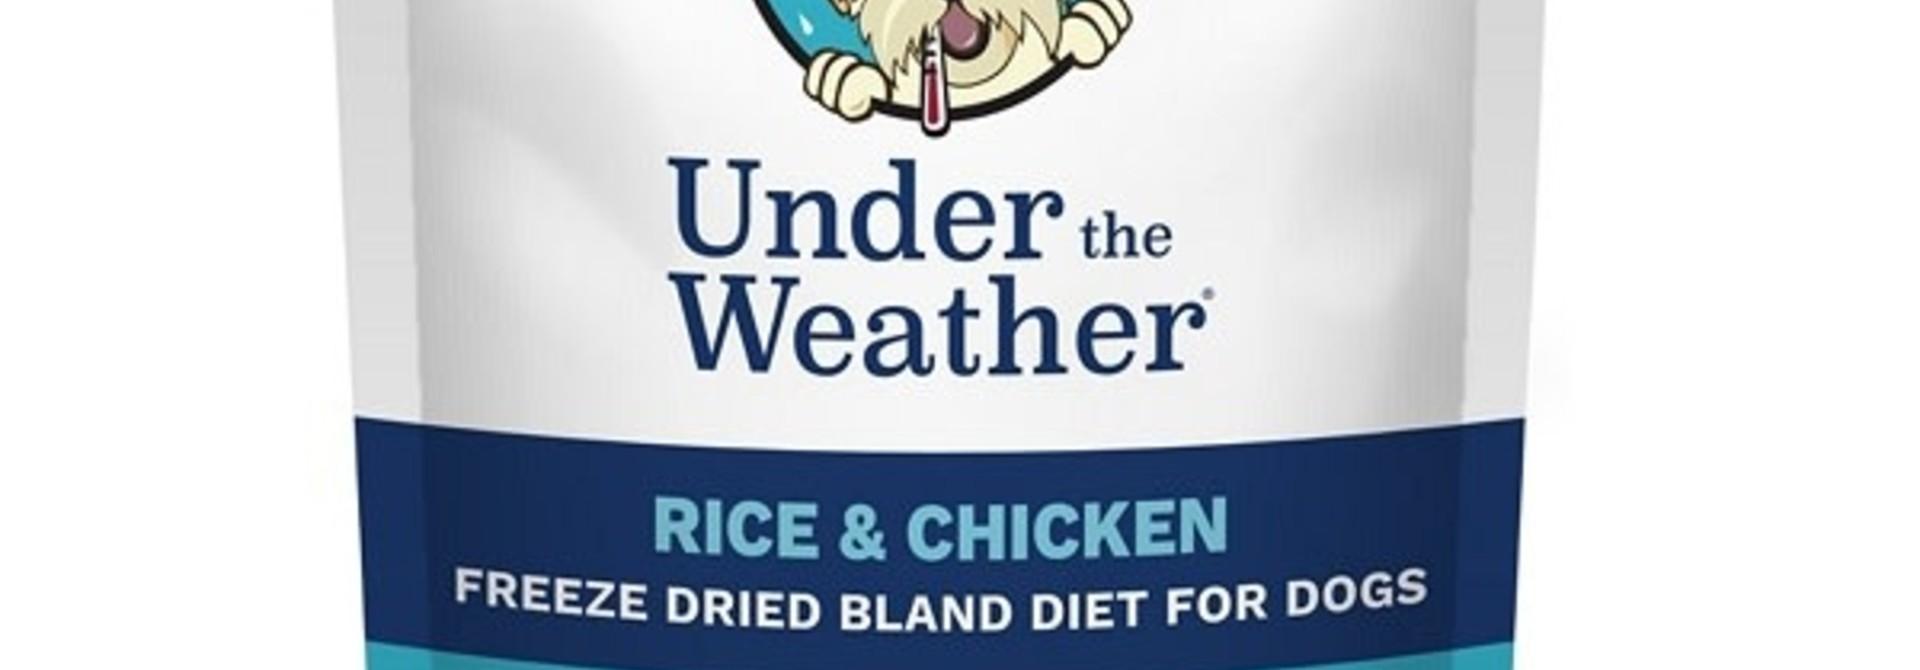 Bland Diets Chicken & Rice w/Electrolytes - 6oz